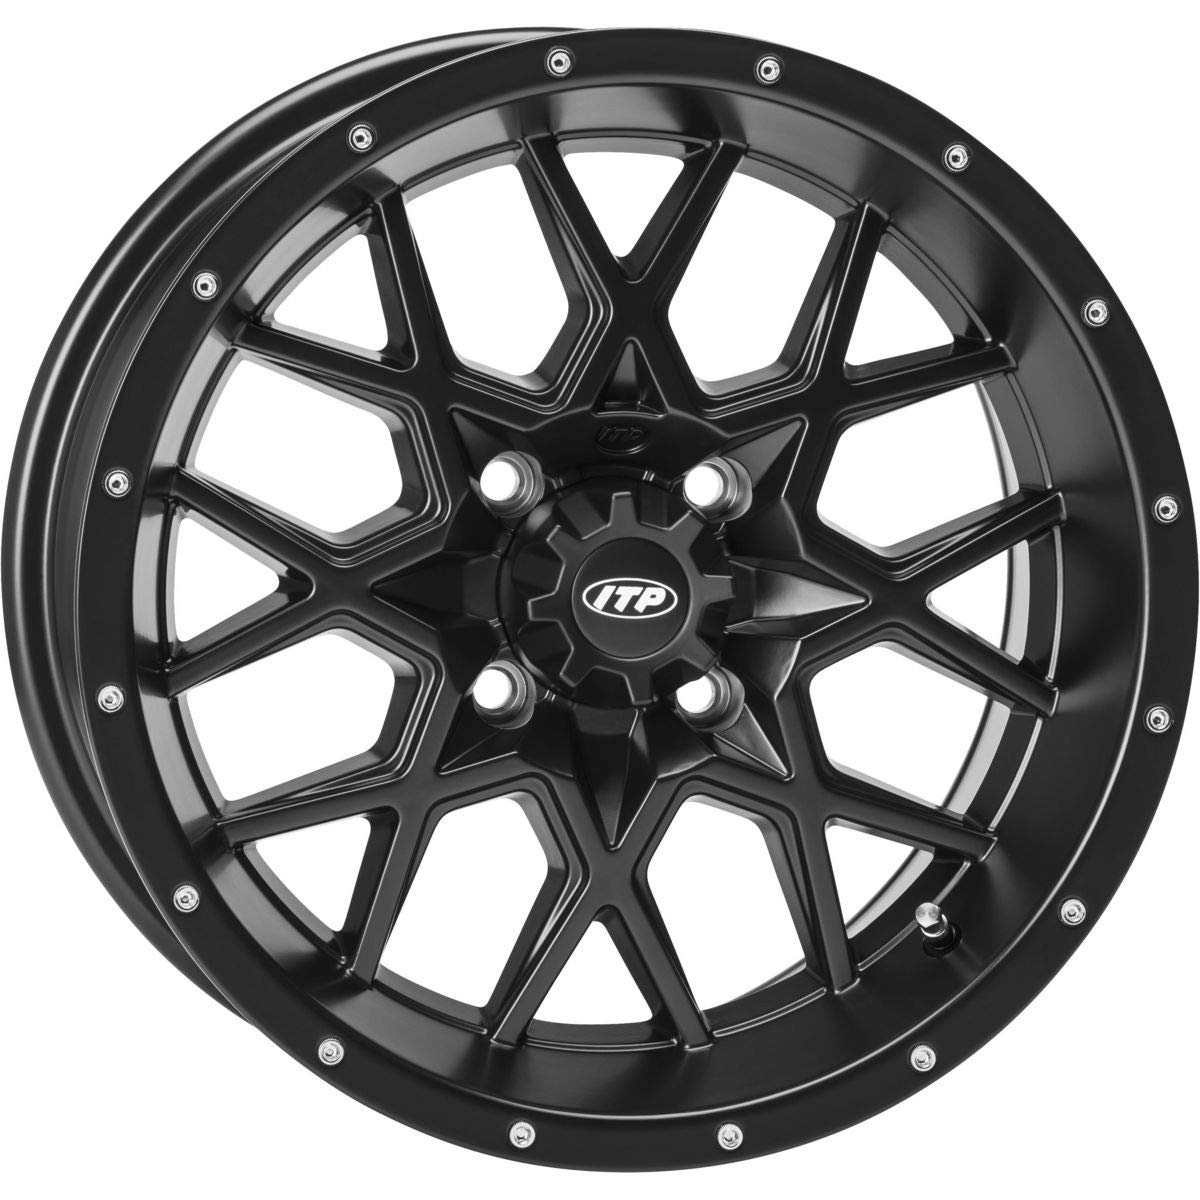 ITP 16-18 Yamaha YXZ1000R Hurricane Wheel Front // 16x7 5+2 4//110 Matte Black